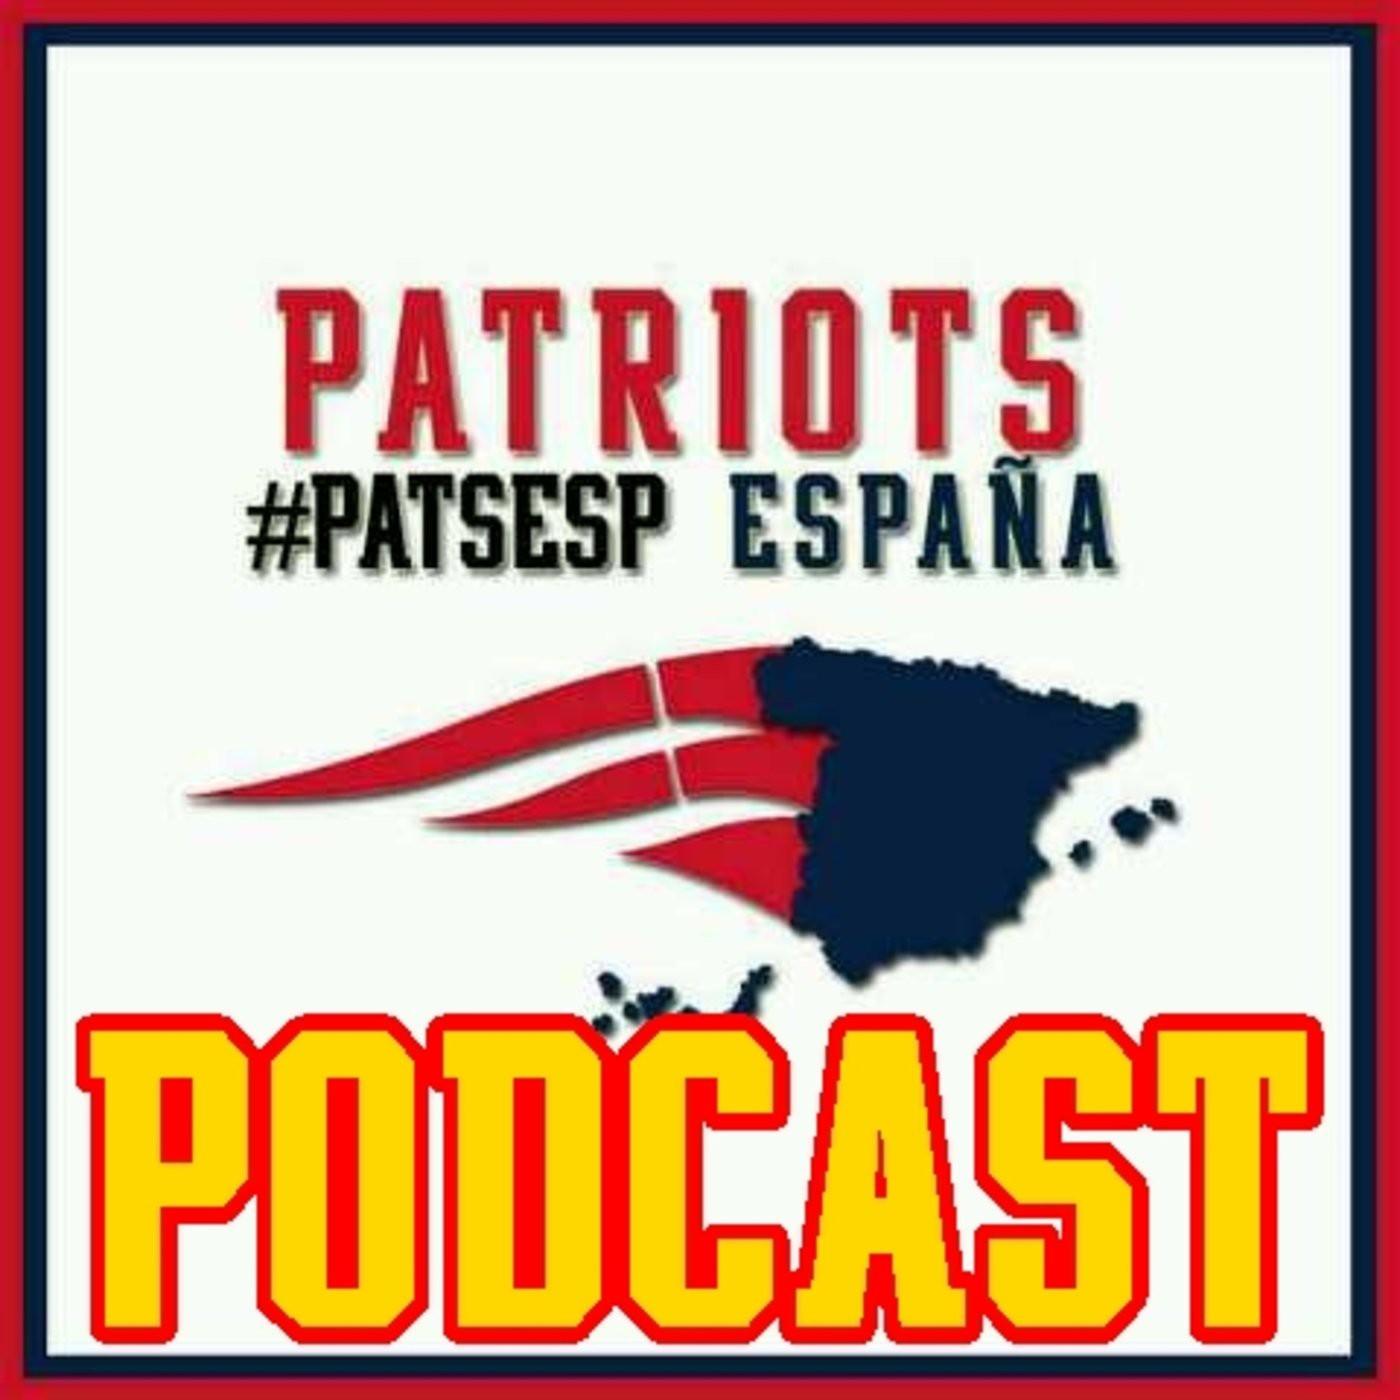 <![CDATA[Podcast de Patriots España]]>